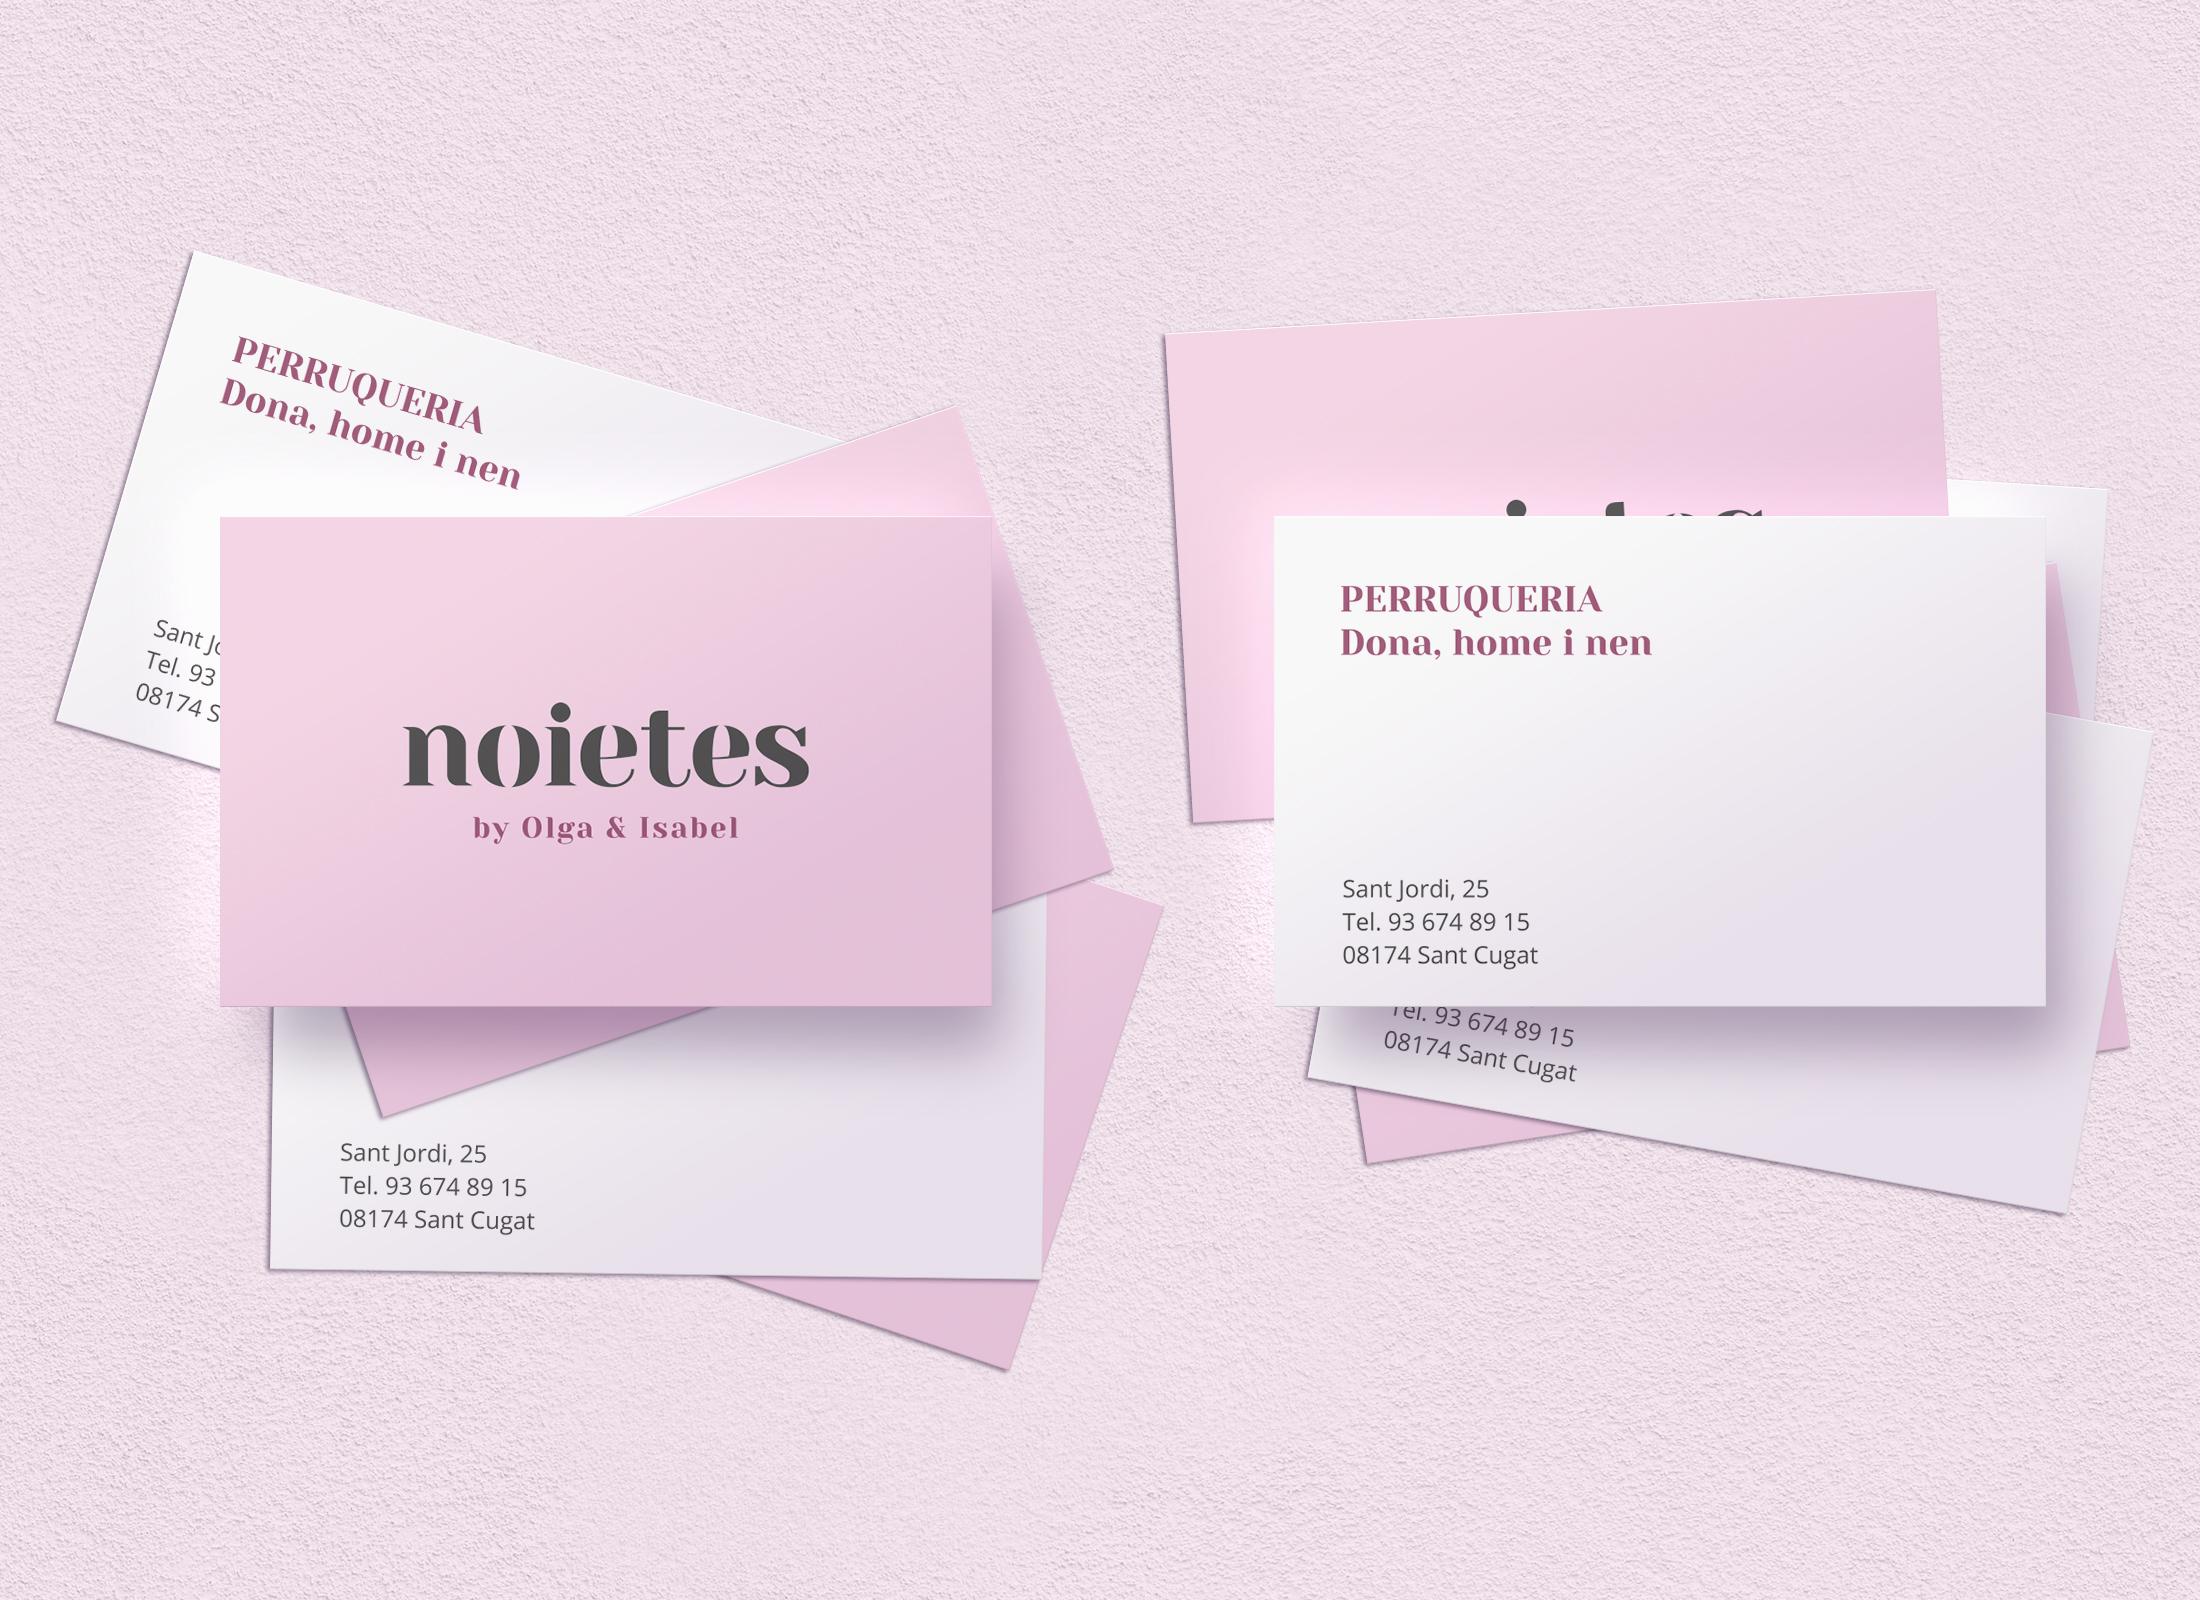 NOIETES_targetes.jpg